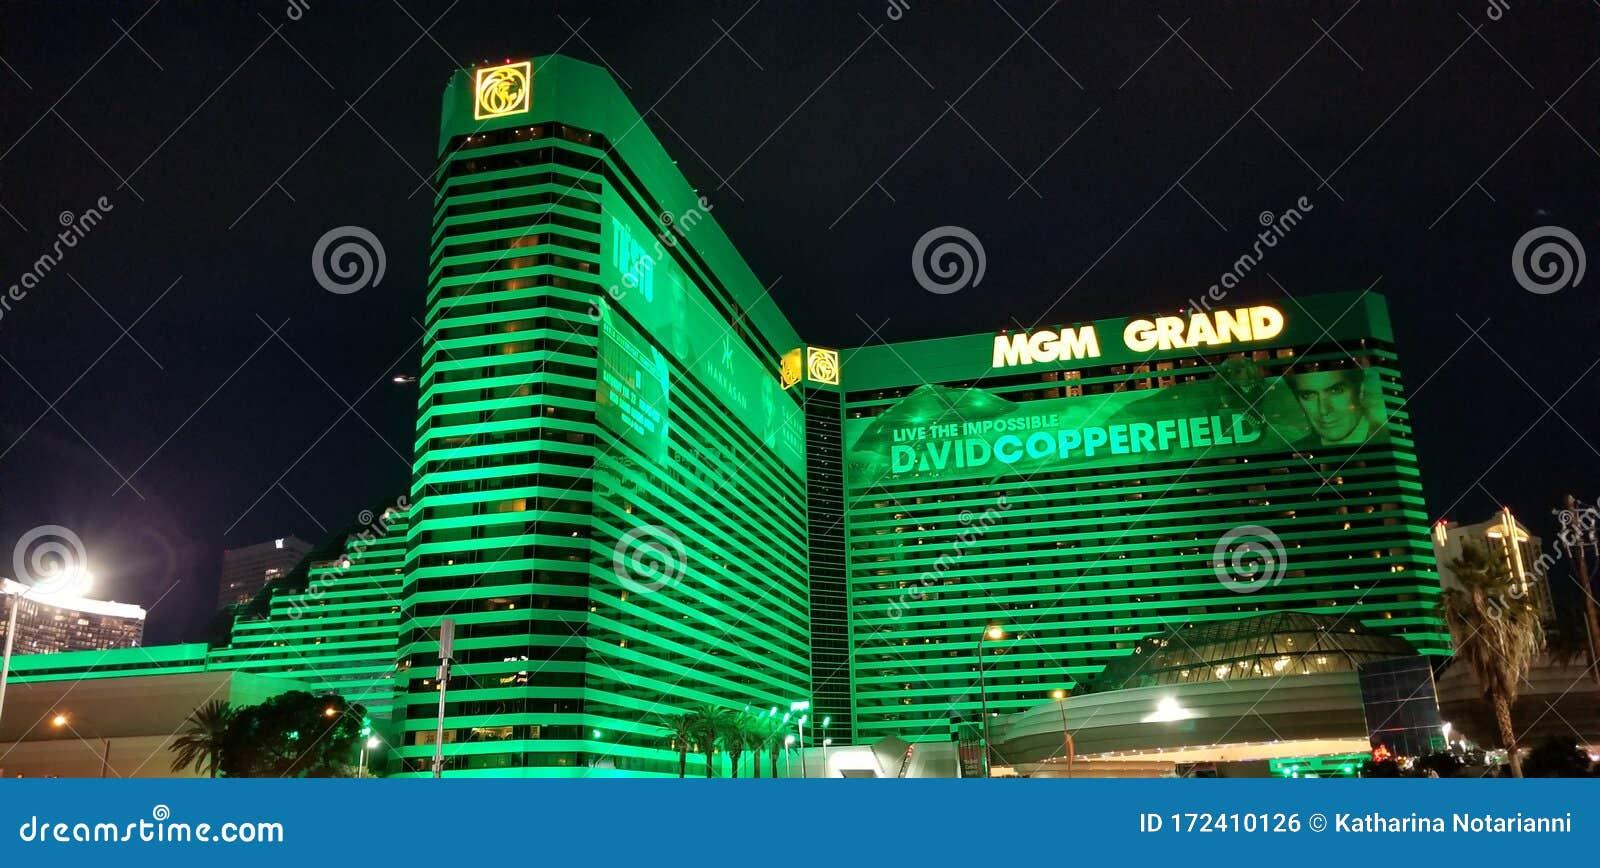 Mgm Grand Hotel In Las Vegas Nevada Editorial Photo Image Of David Logo 172410126